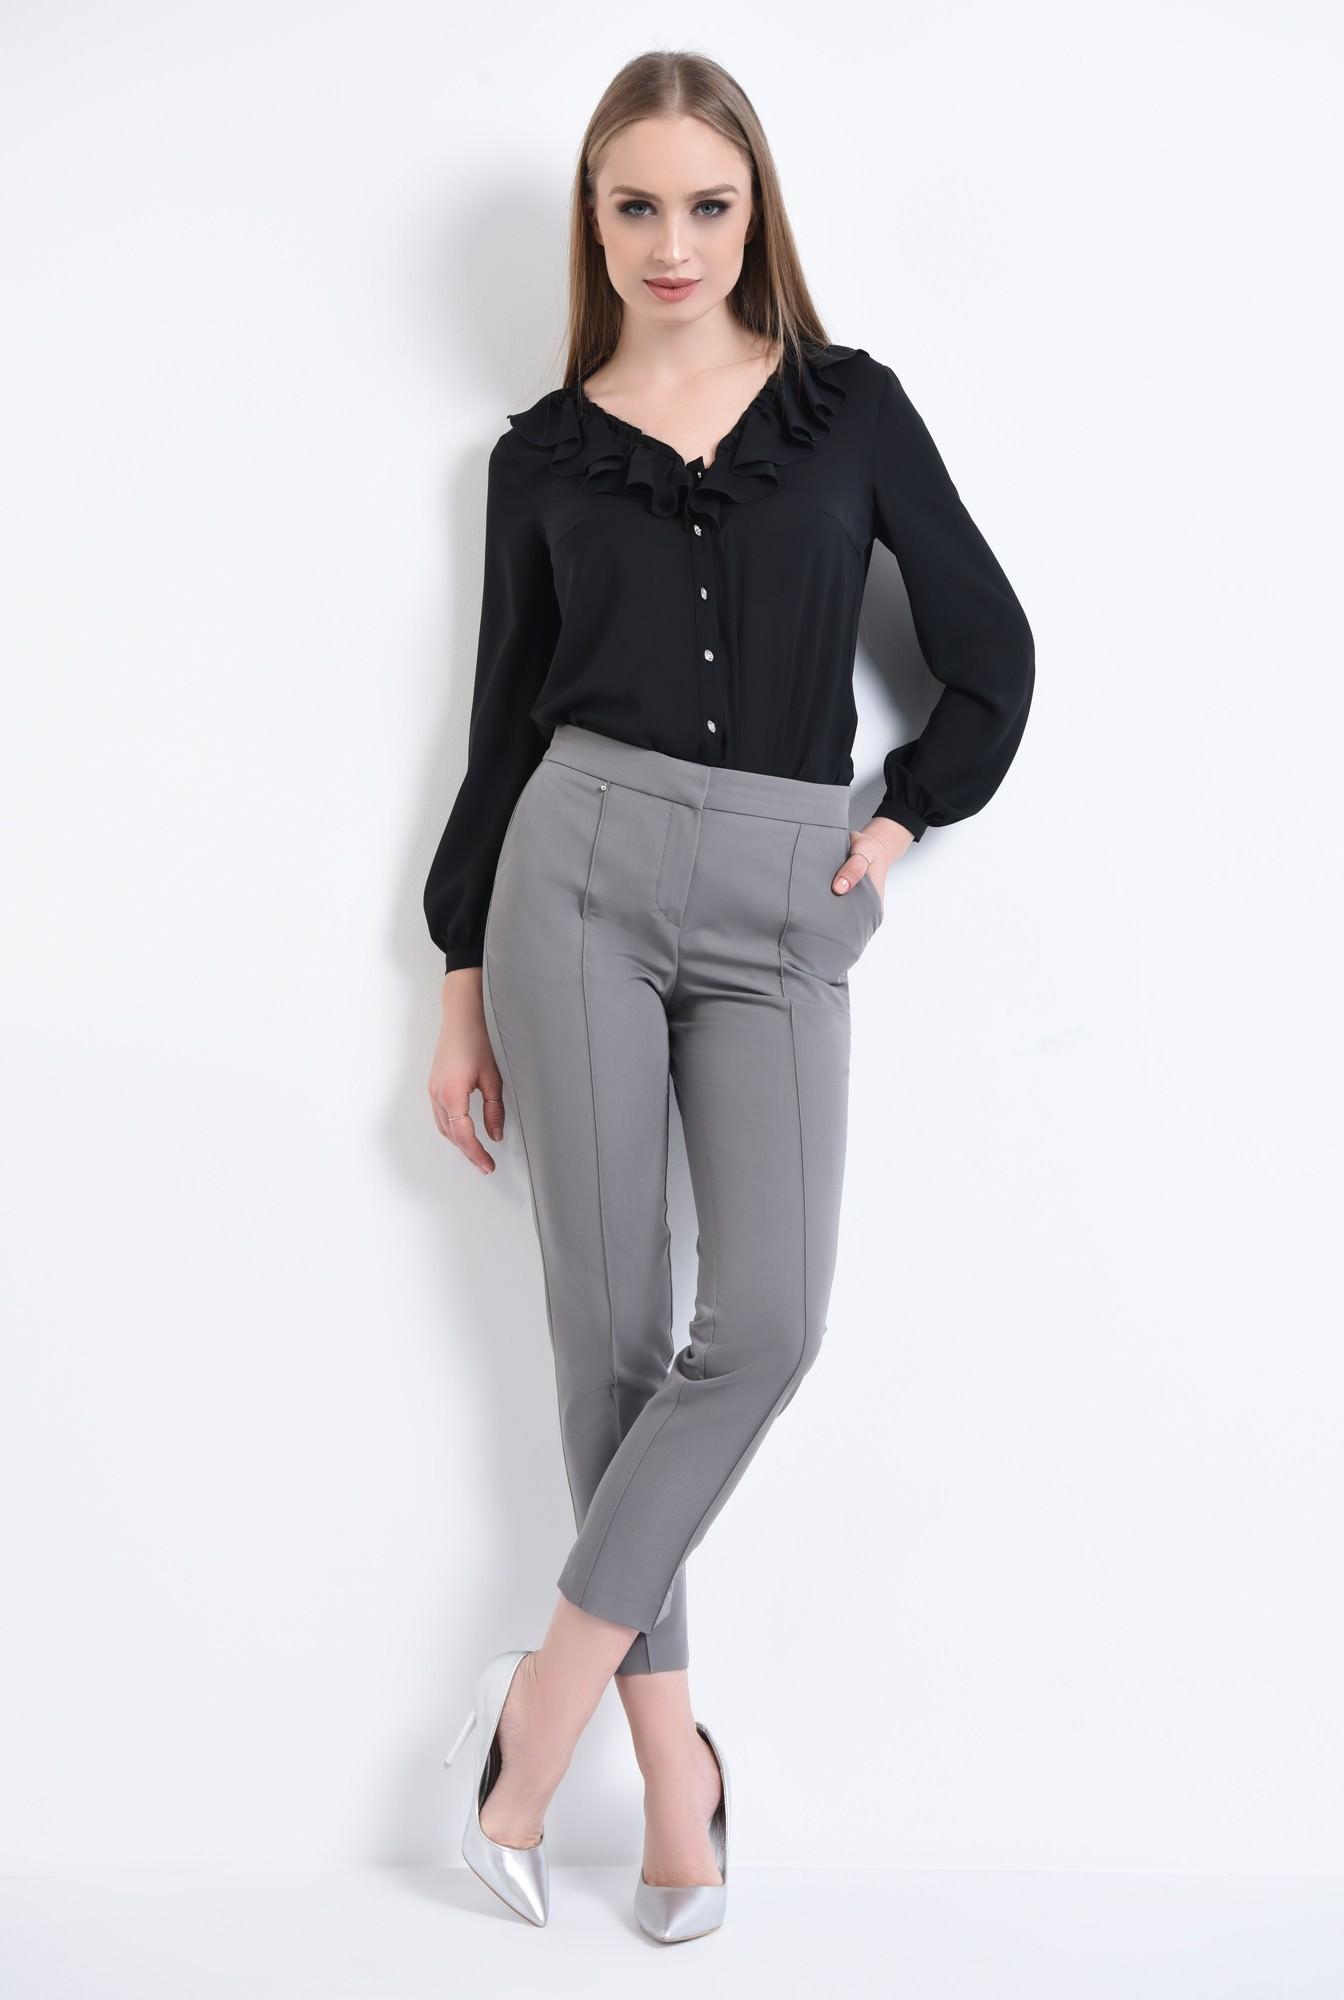 3 - Bluza casual, negru, anchior